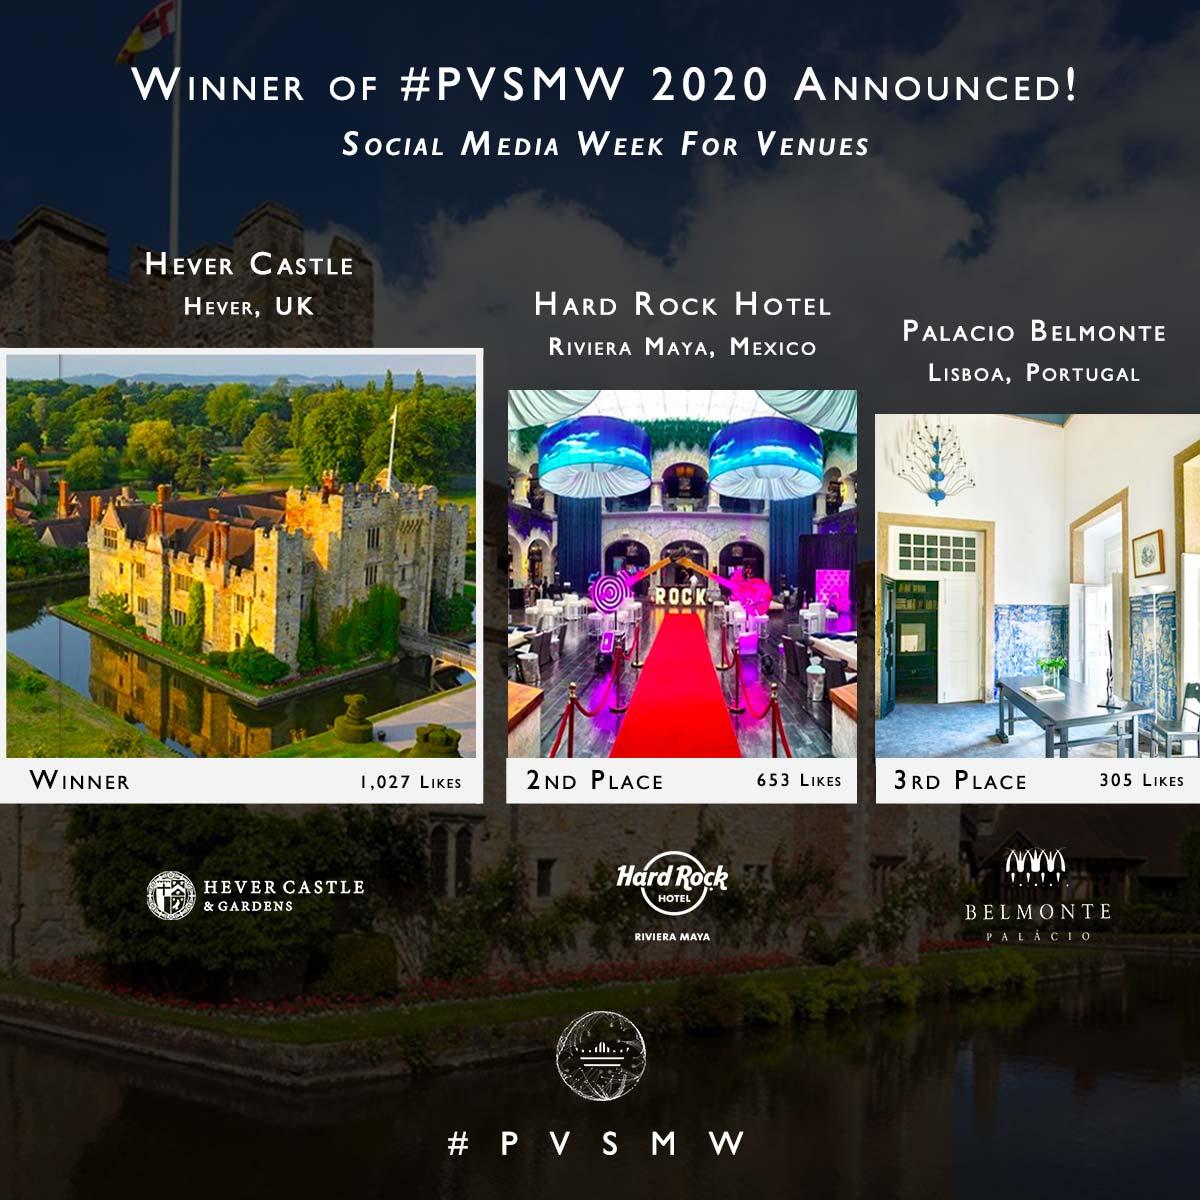 Prestigious Venues Social Media Week 2020 Results, PVSMW Winners 2020, Prestigious Venues